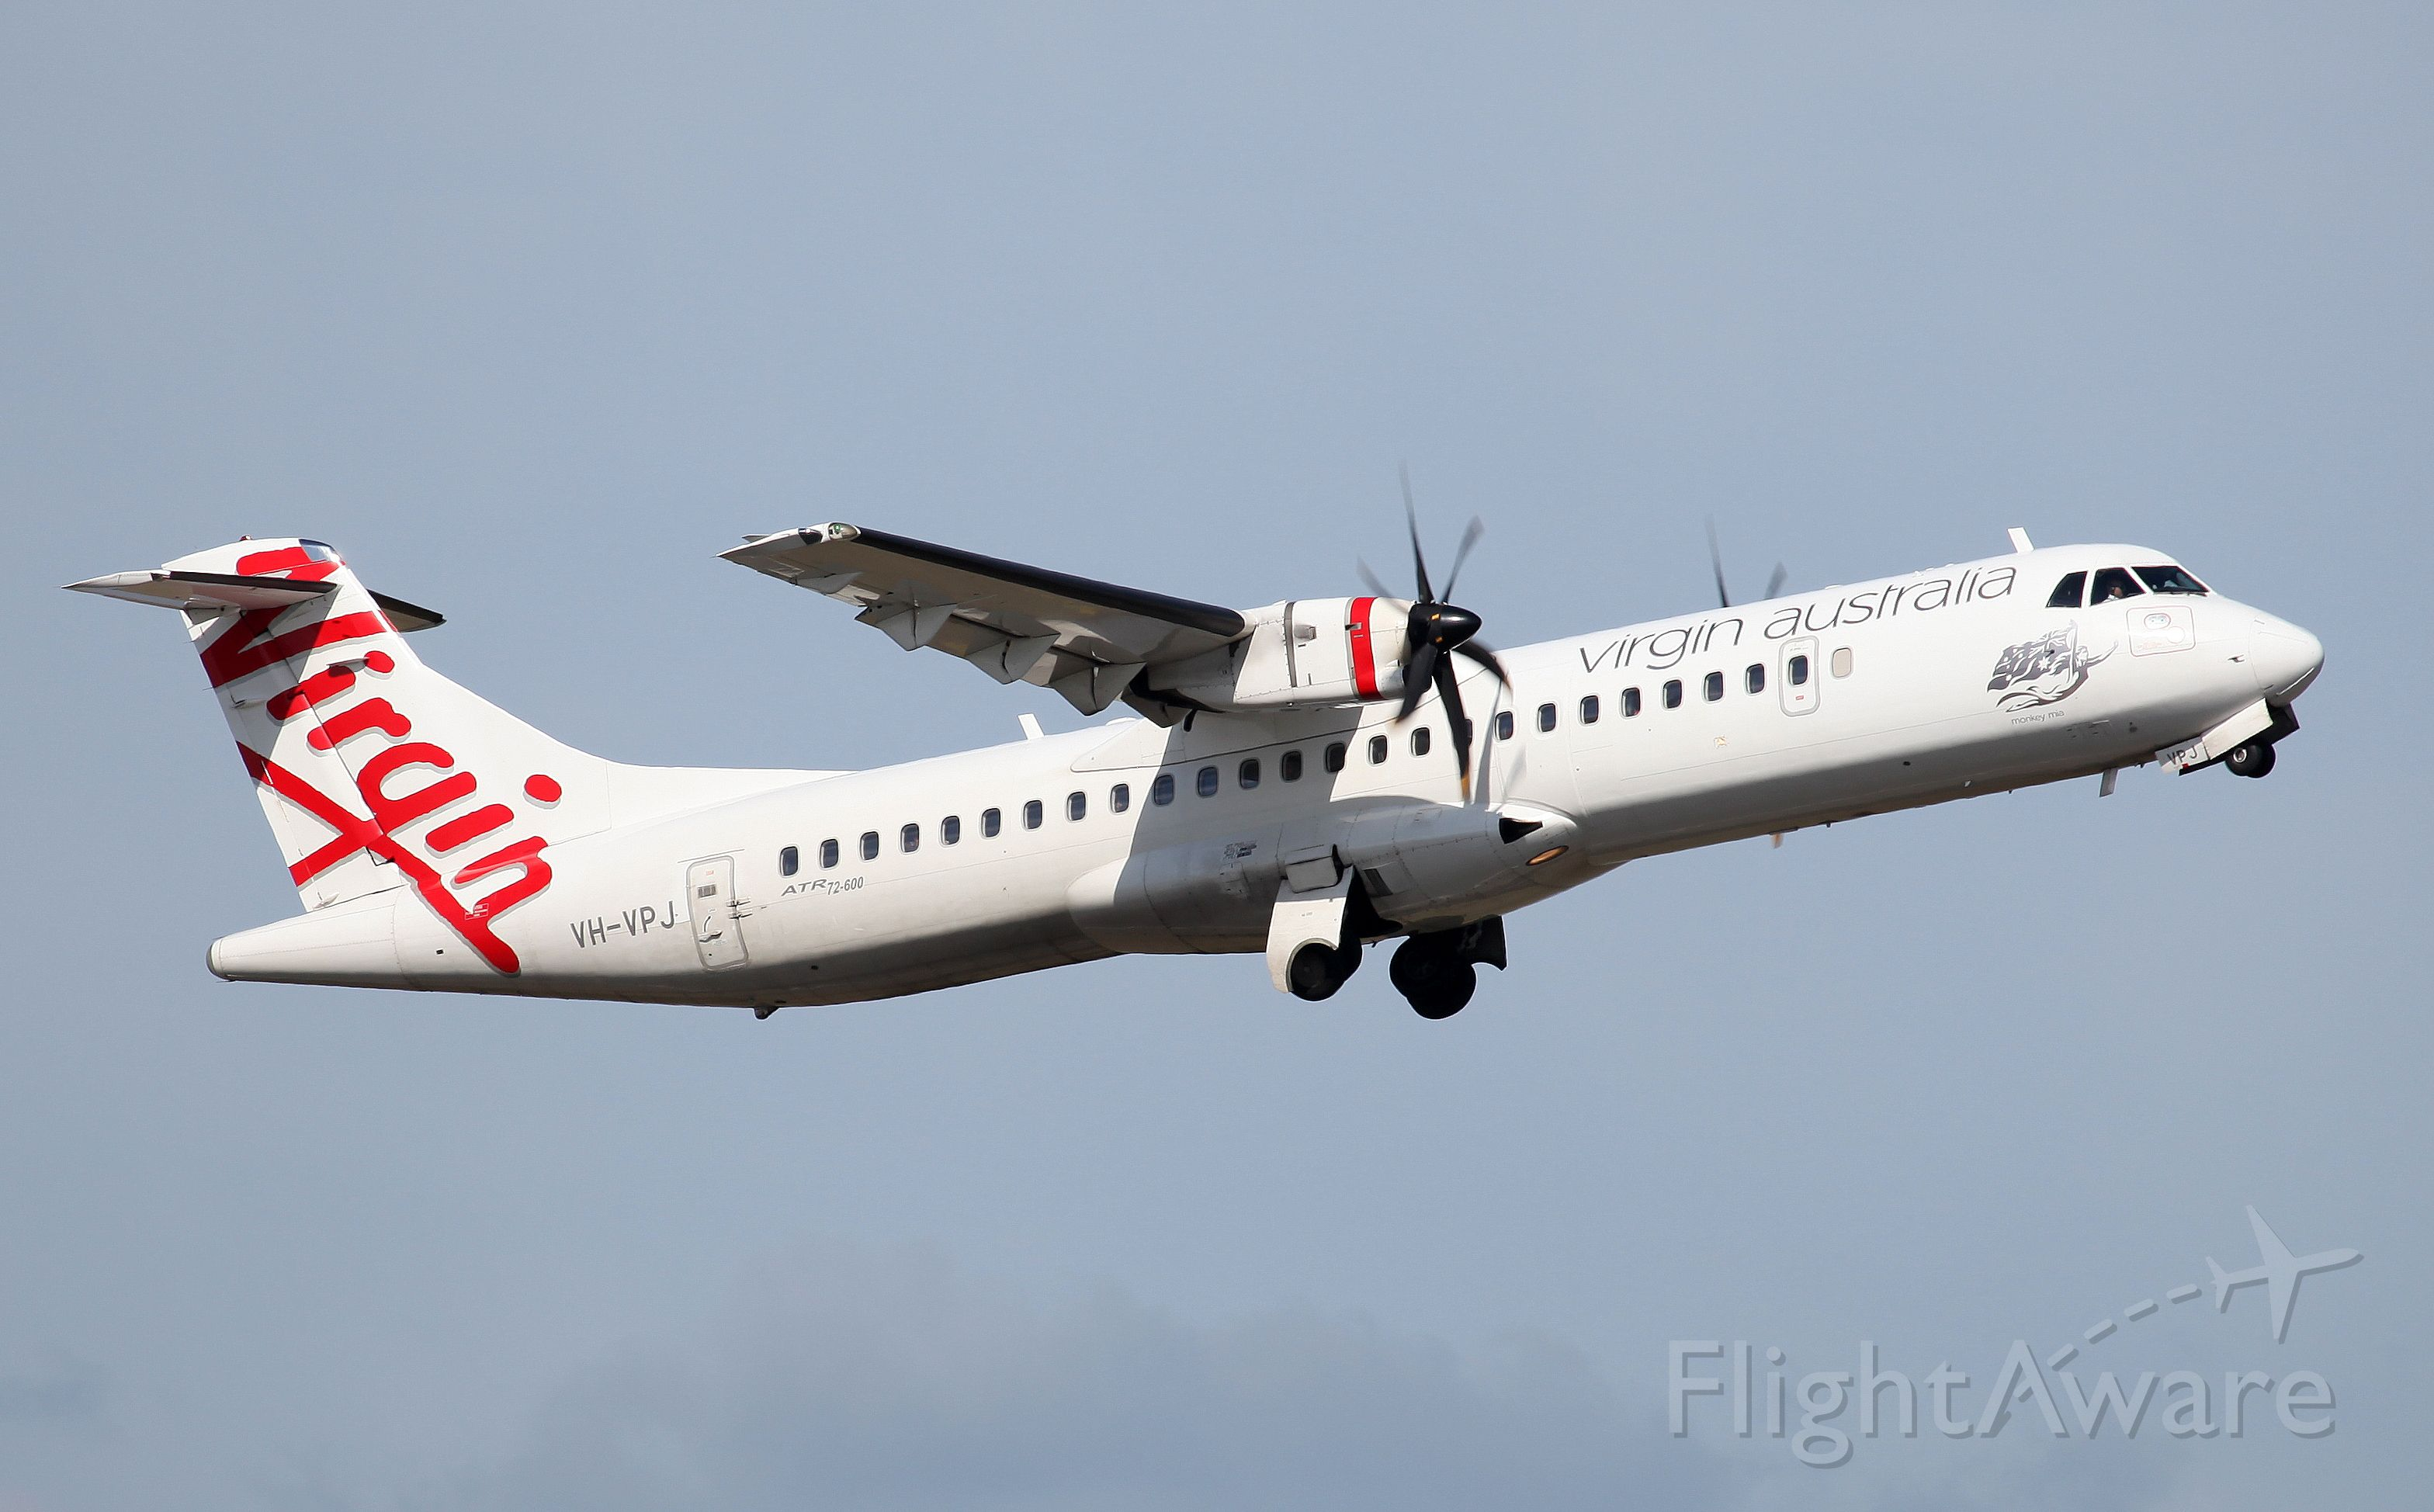 ATR ATR-72 (VH-VPJ) - Climbing from Rwy 34R